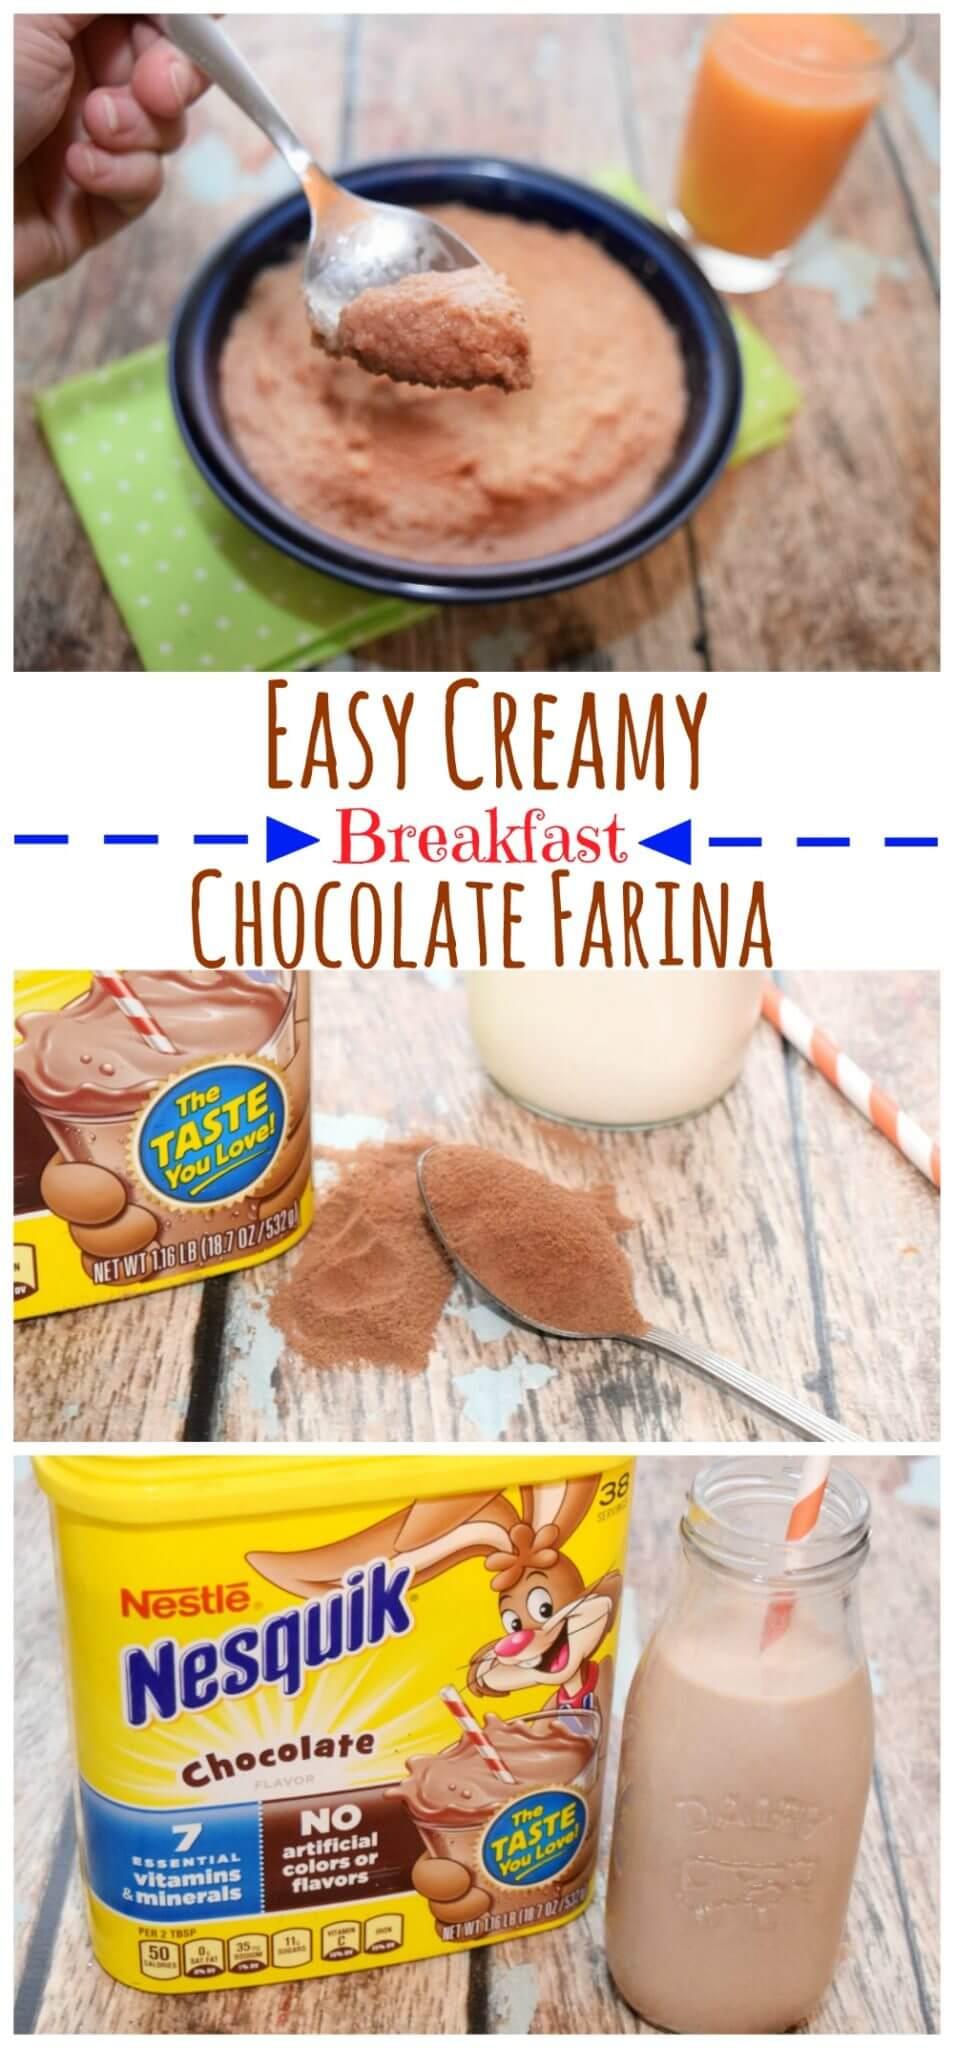 Make Creamy Delicious Chocolate Farina for #breakfast w/ Nesquik #StirImagination #ad